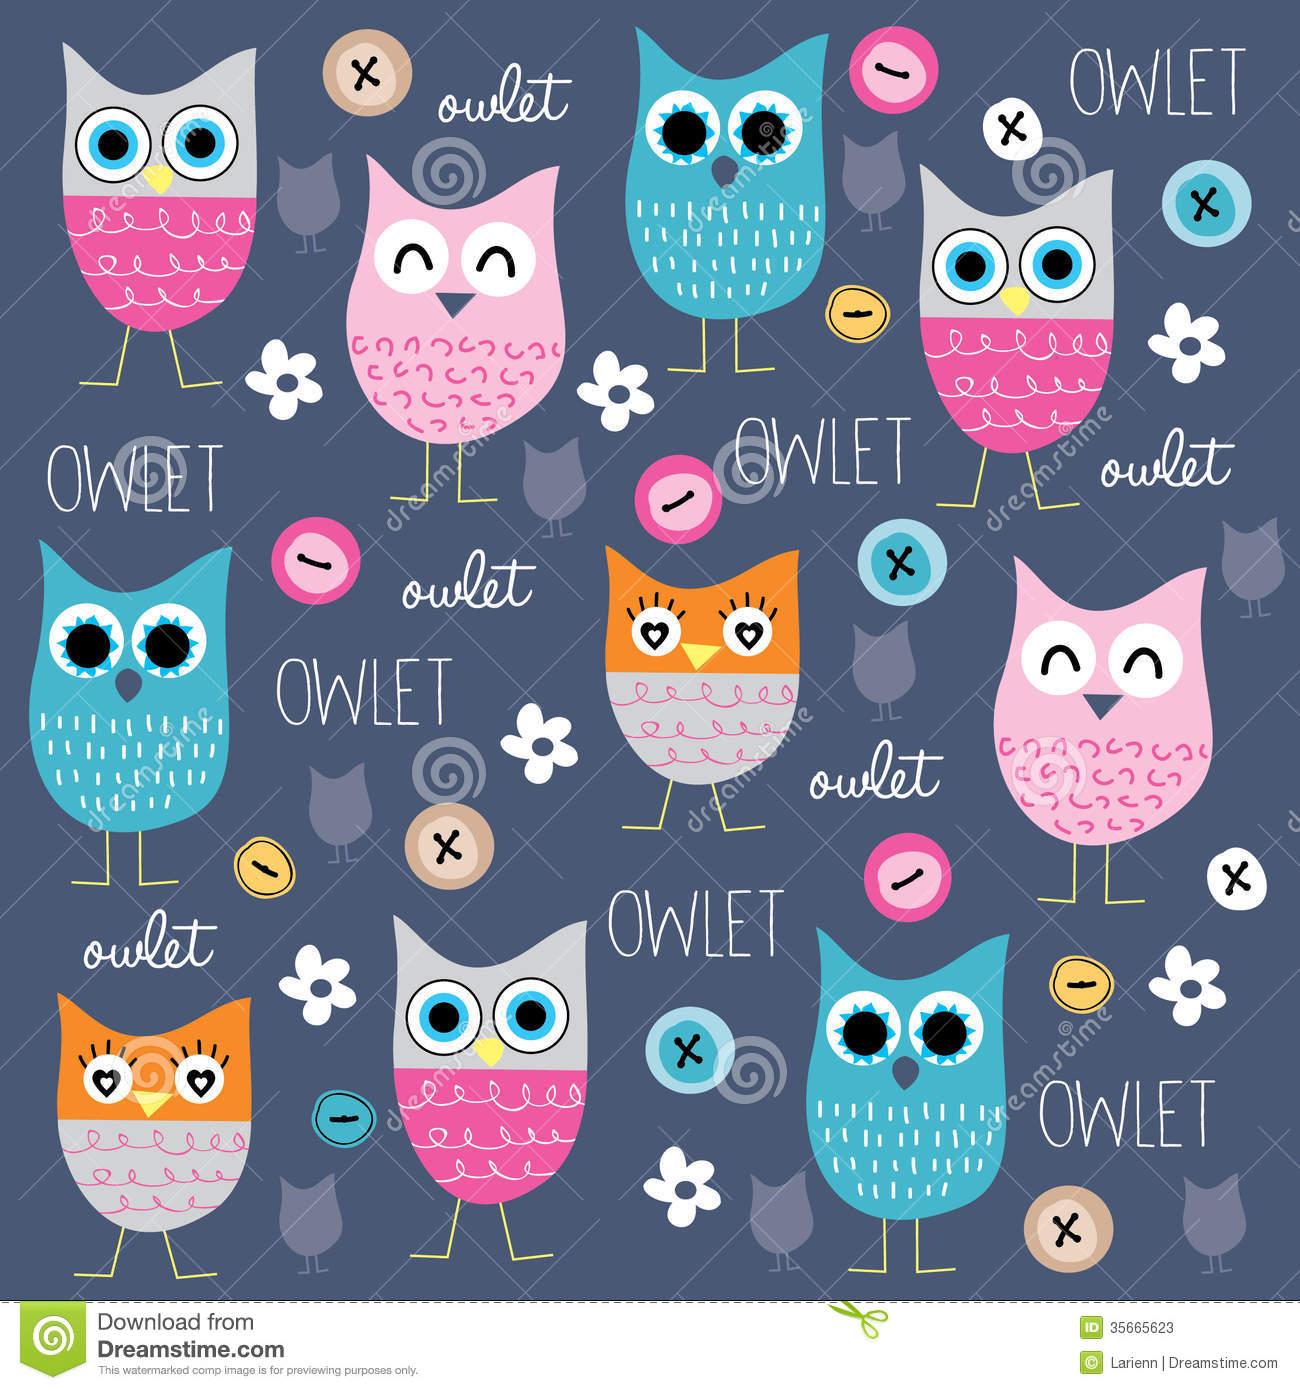 Cartoon Owl Desktop Wallpaper 4K Ultra HD Wallpapers